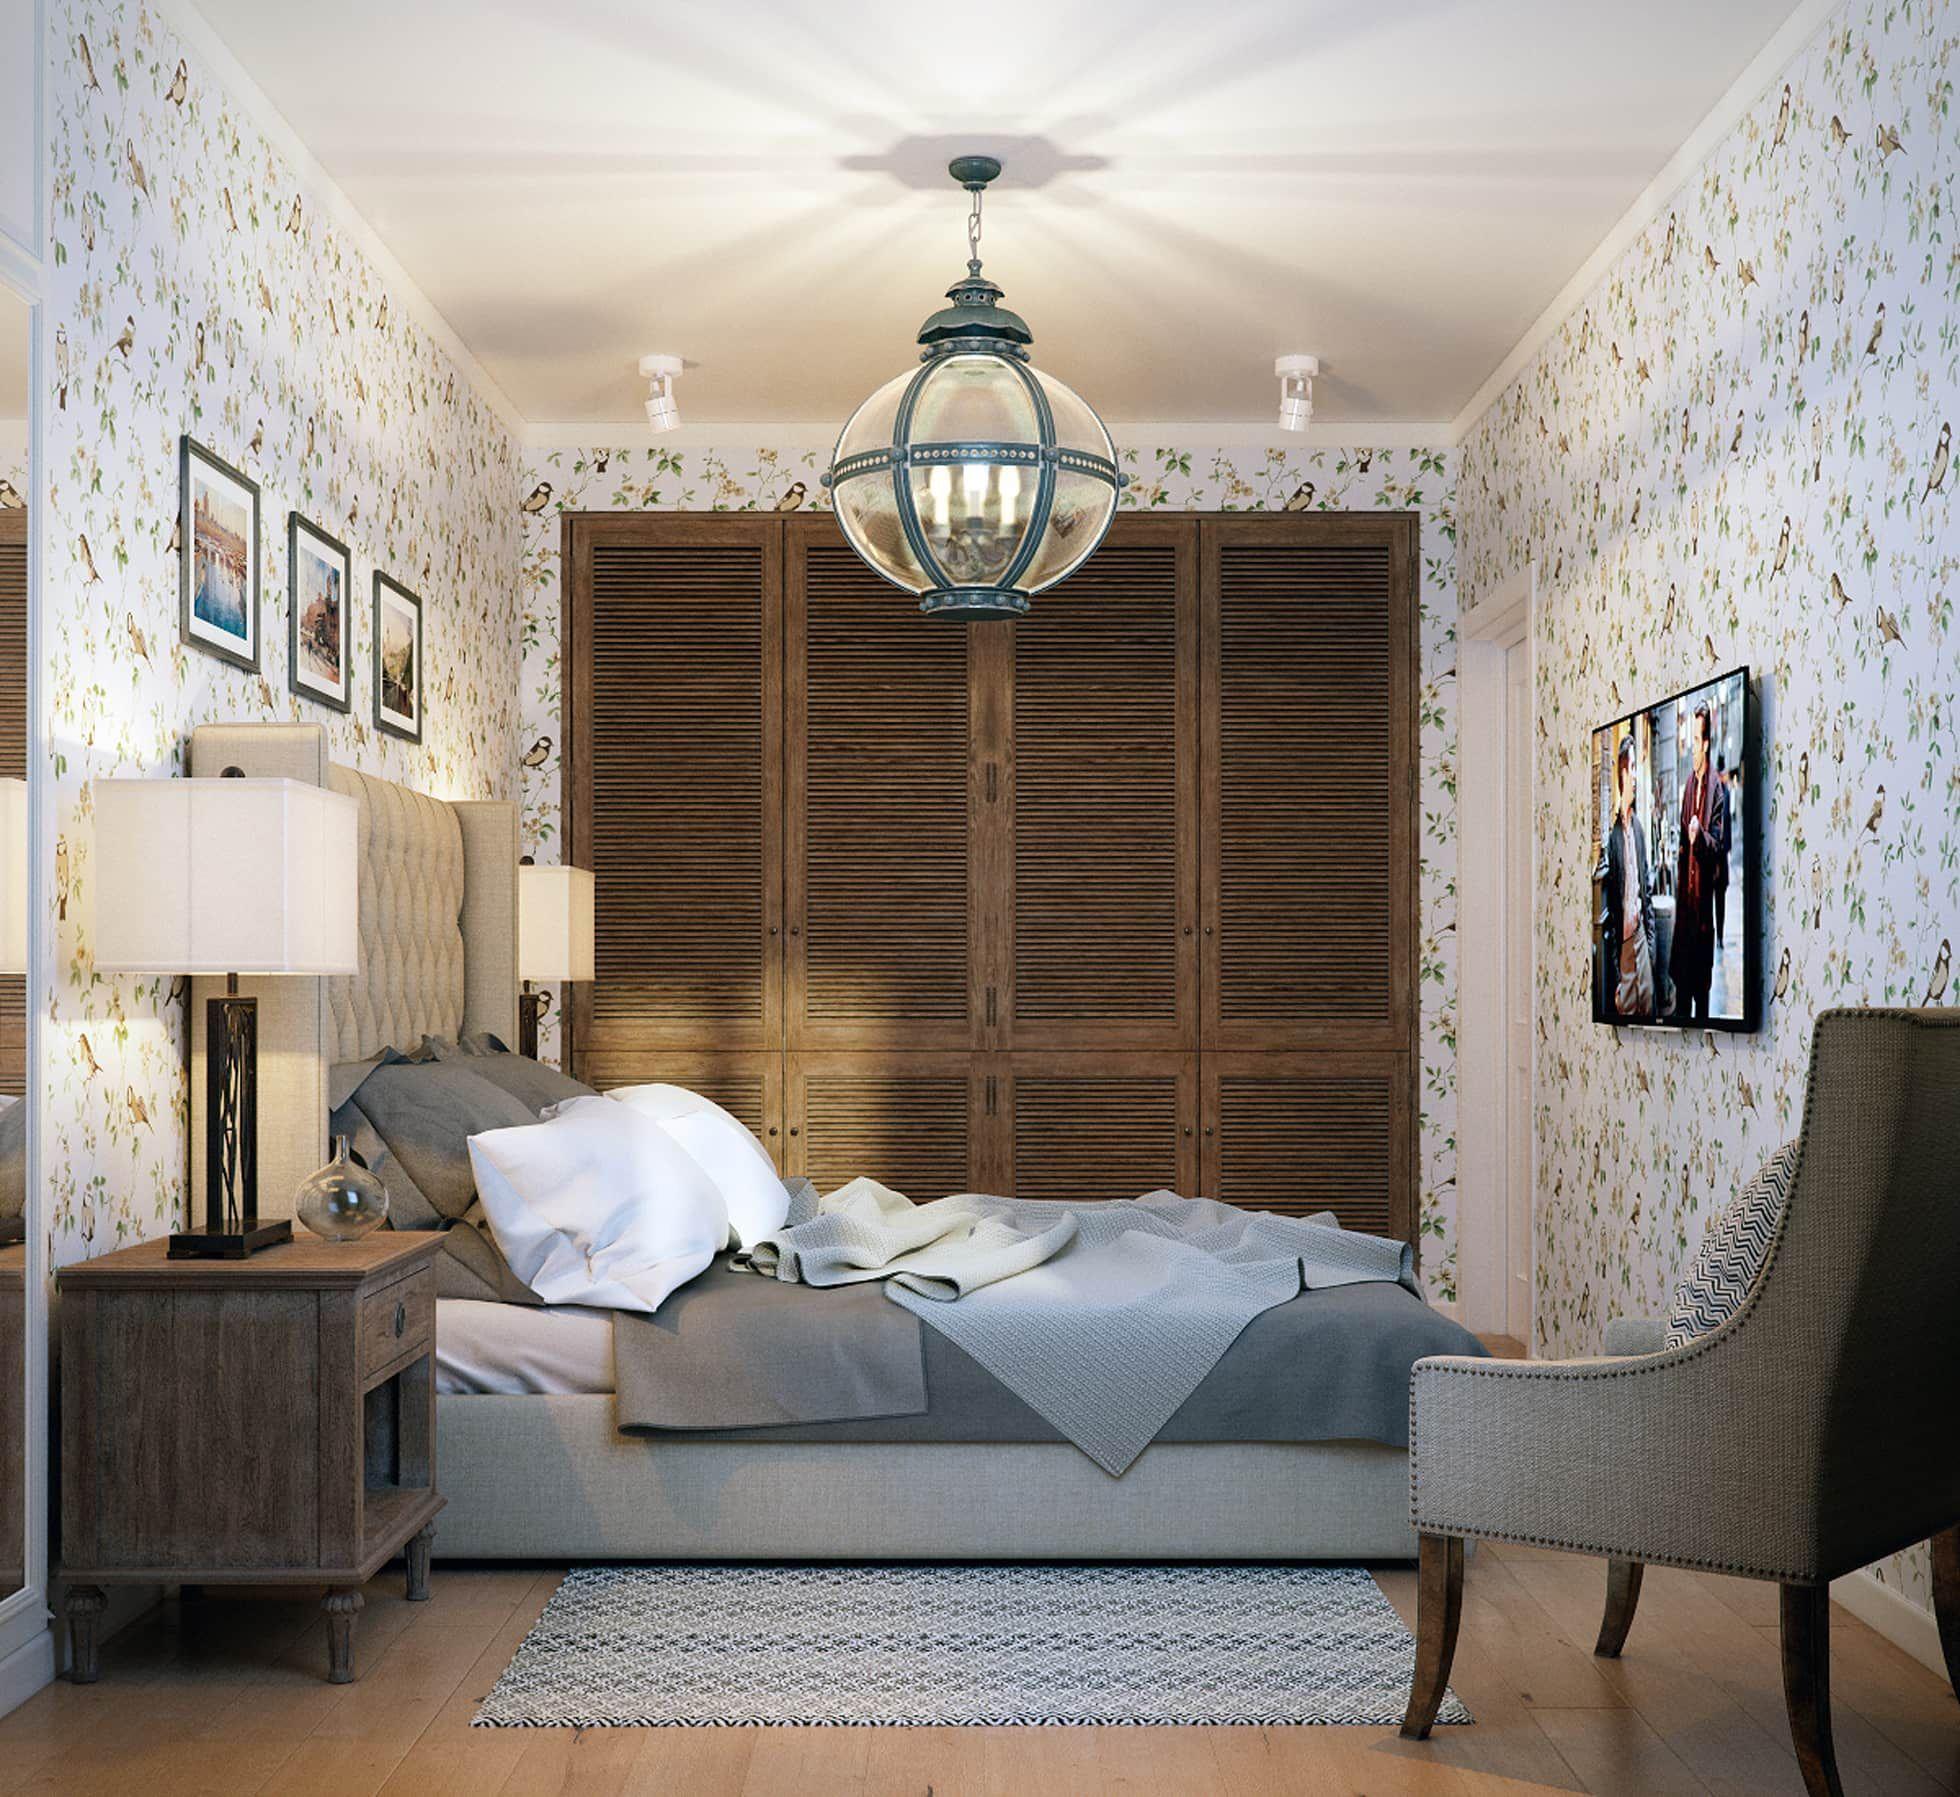 Chambre A Coucher Inspiration Design De Decor Tendances Chambre